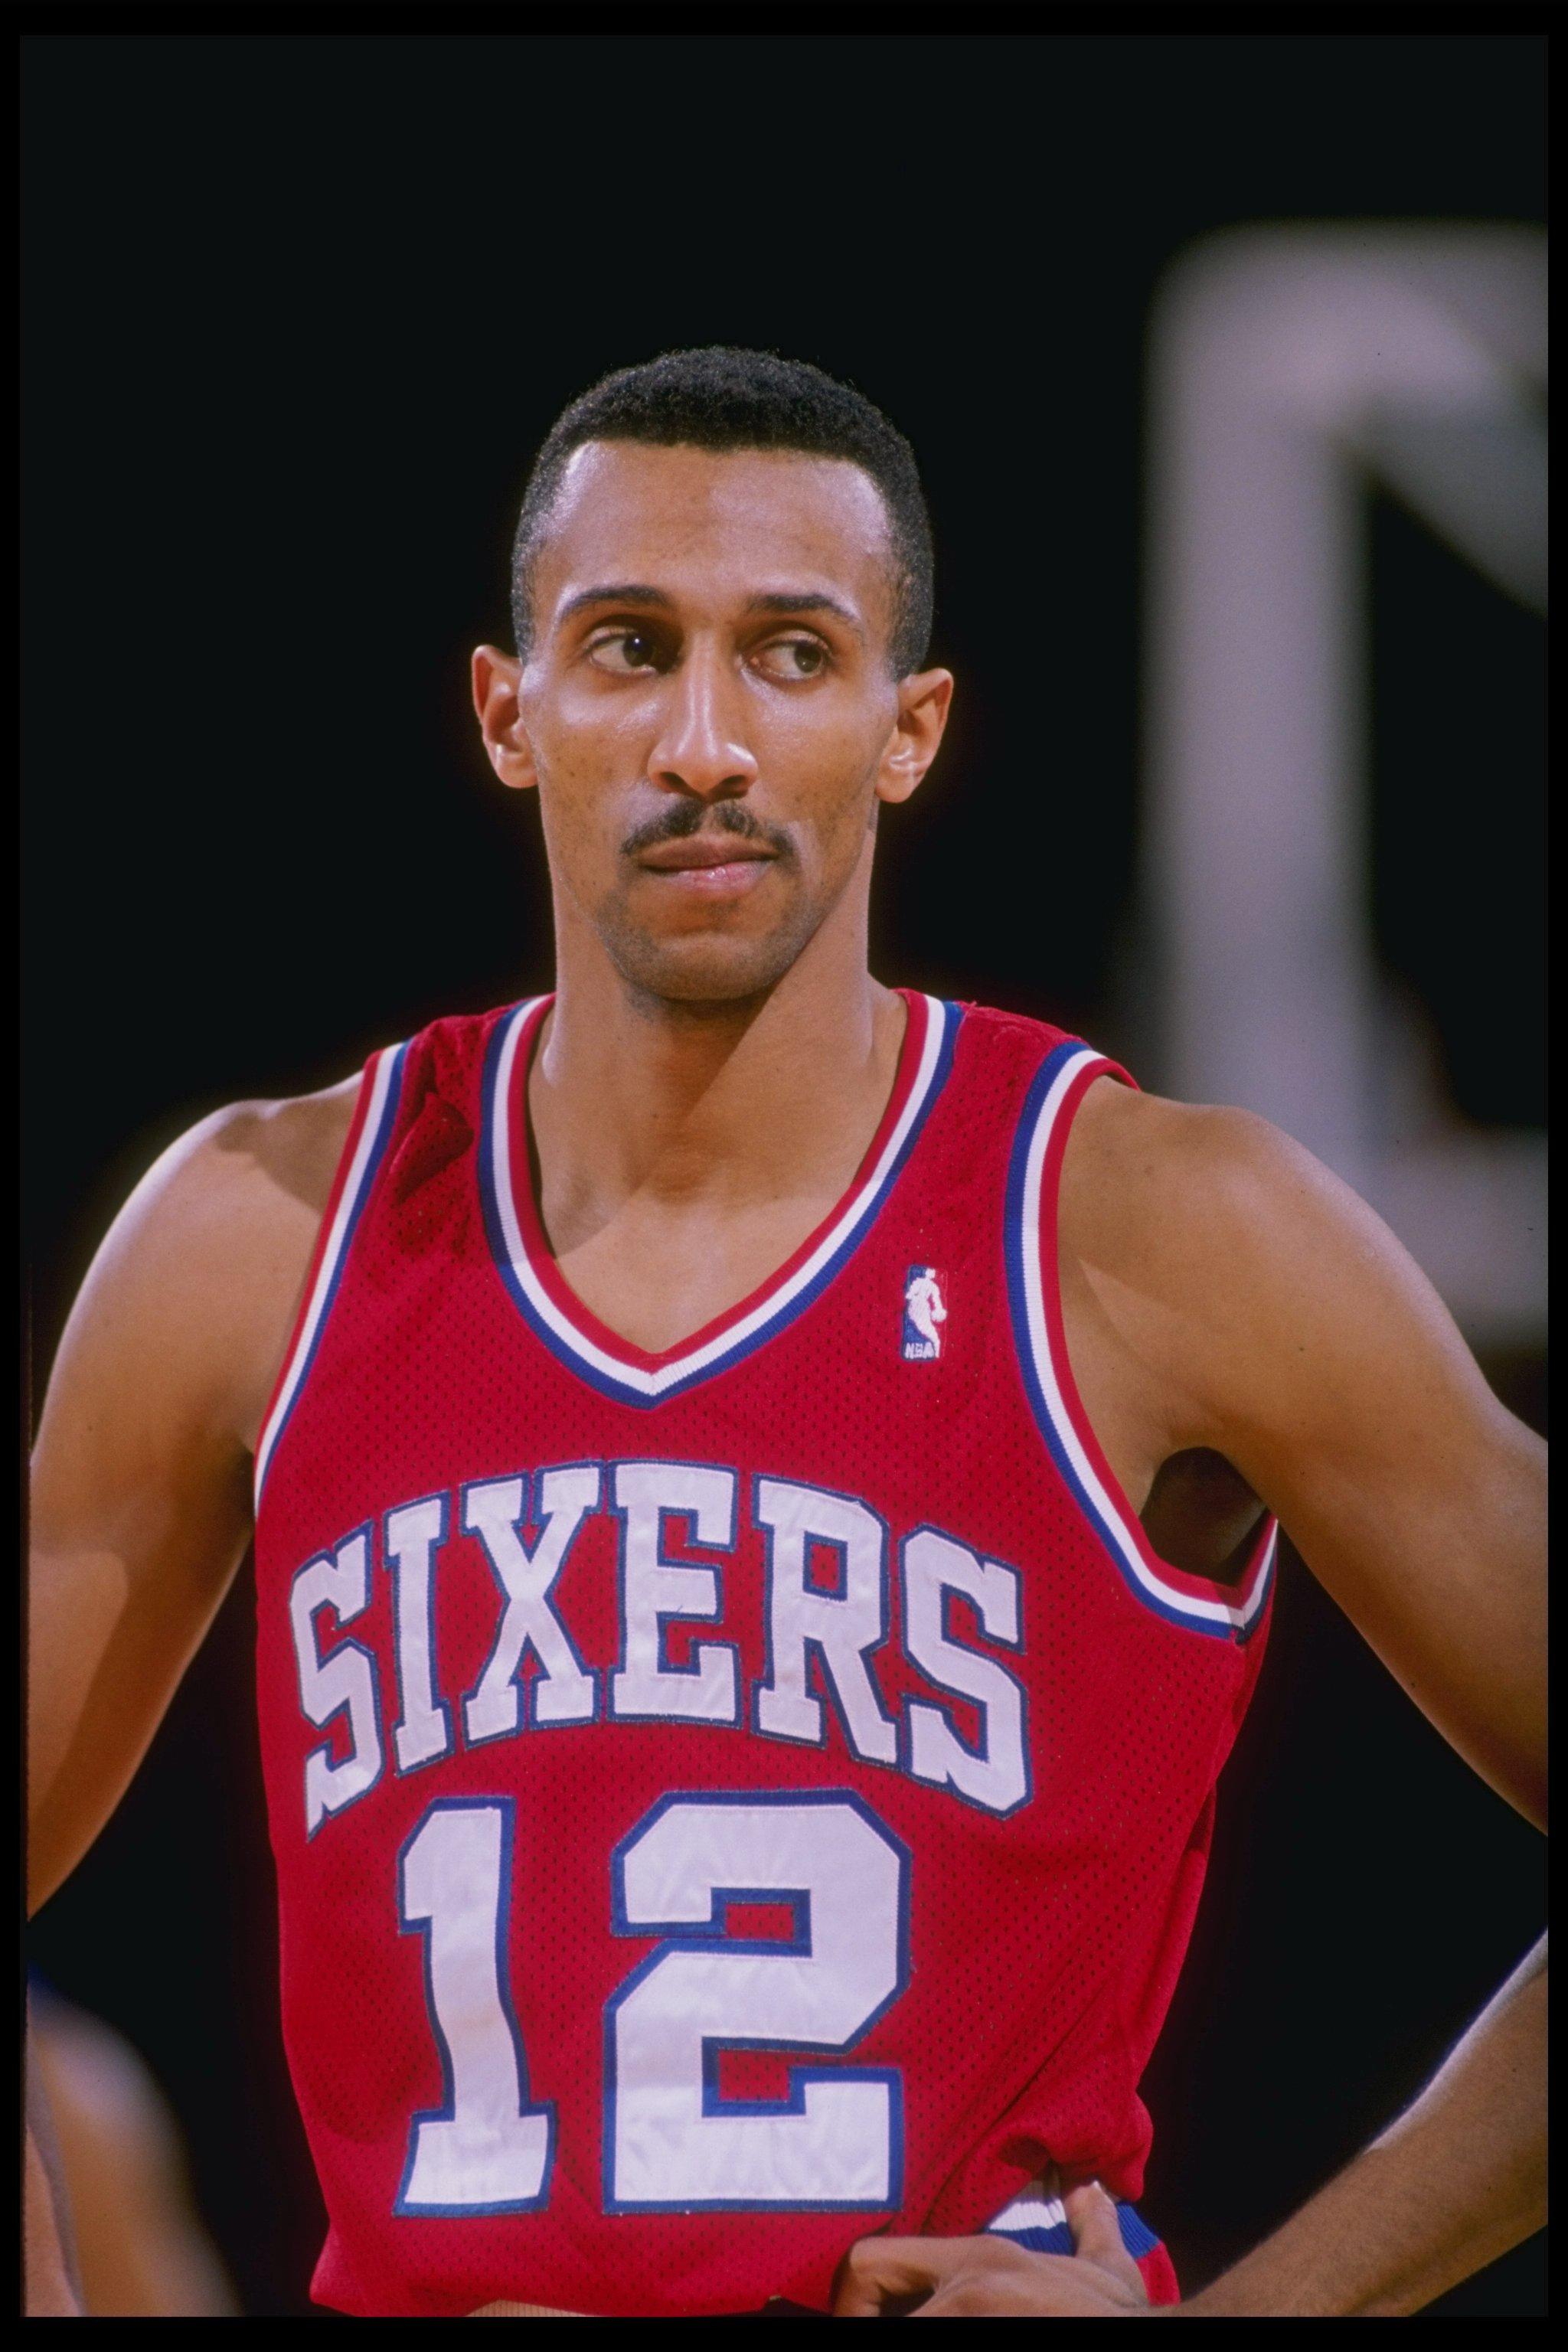 Guard Johnny Dawkins of the Philadelphia 76ers looks on.